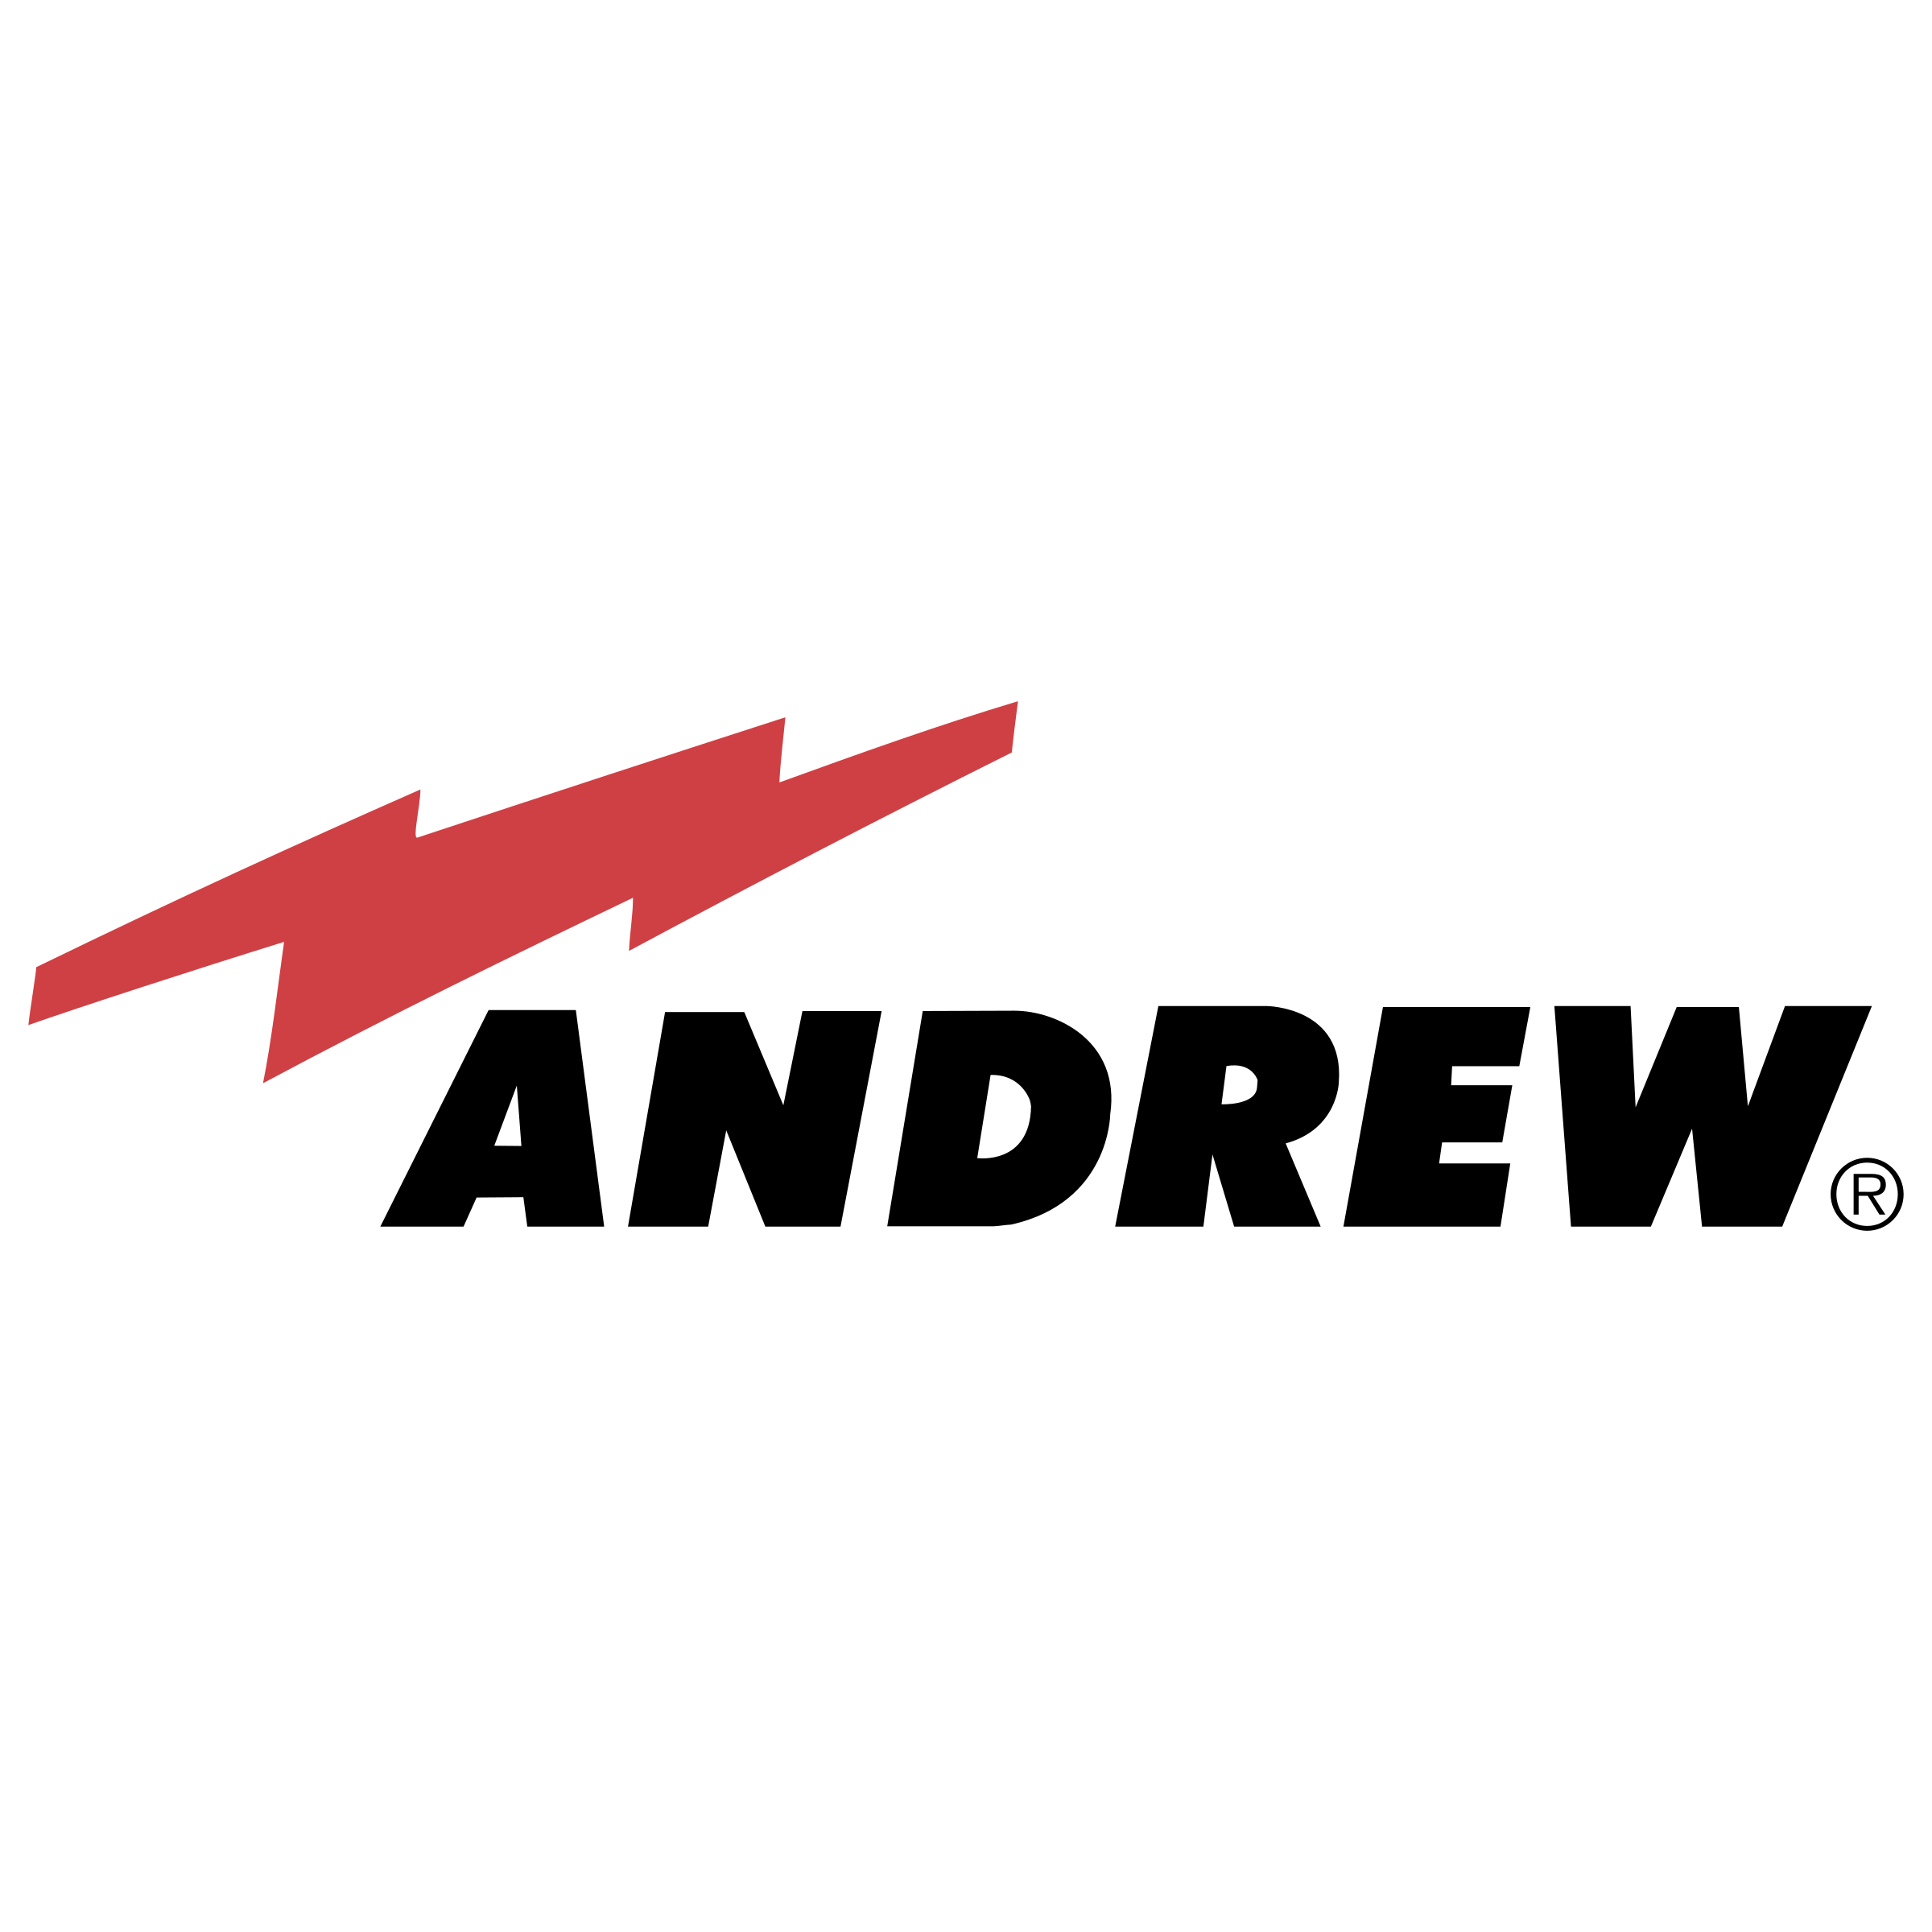 Andrew Logo PNG Transparent & SVG Vector.